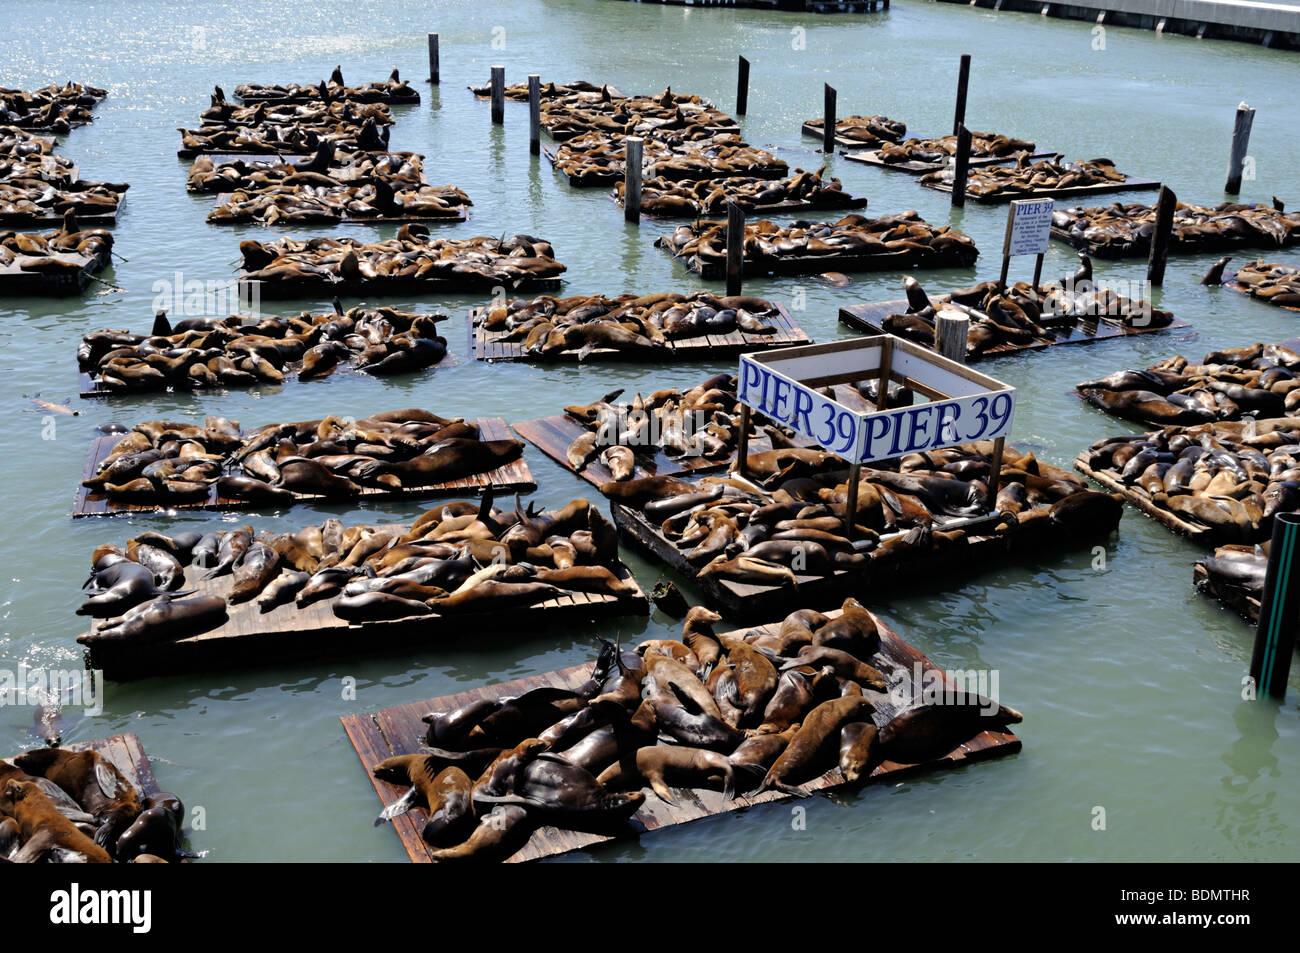 Seals At Pier 39 Fisherman S Wharf San Francisco Stock Photo Alamy